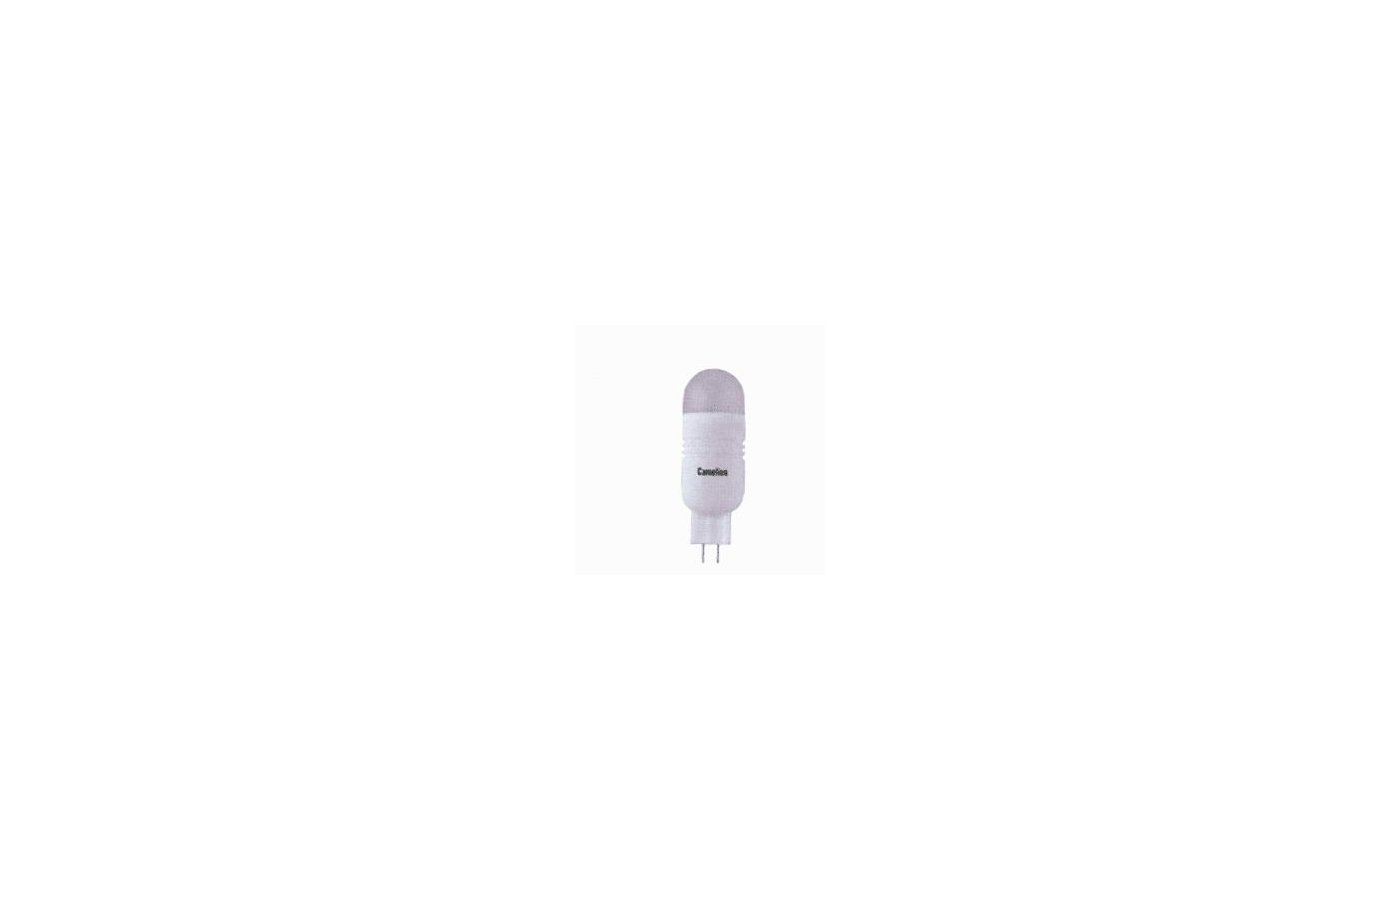 Лампочки LED Camelion LED2.5-JC/830/G4 (Эл.лампа светодиодная 2.5Вт 12В)